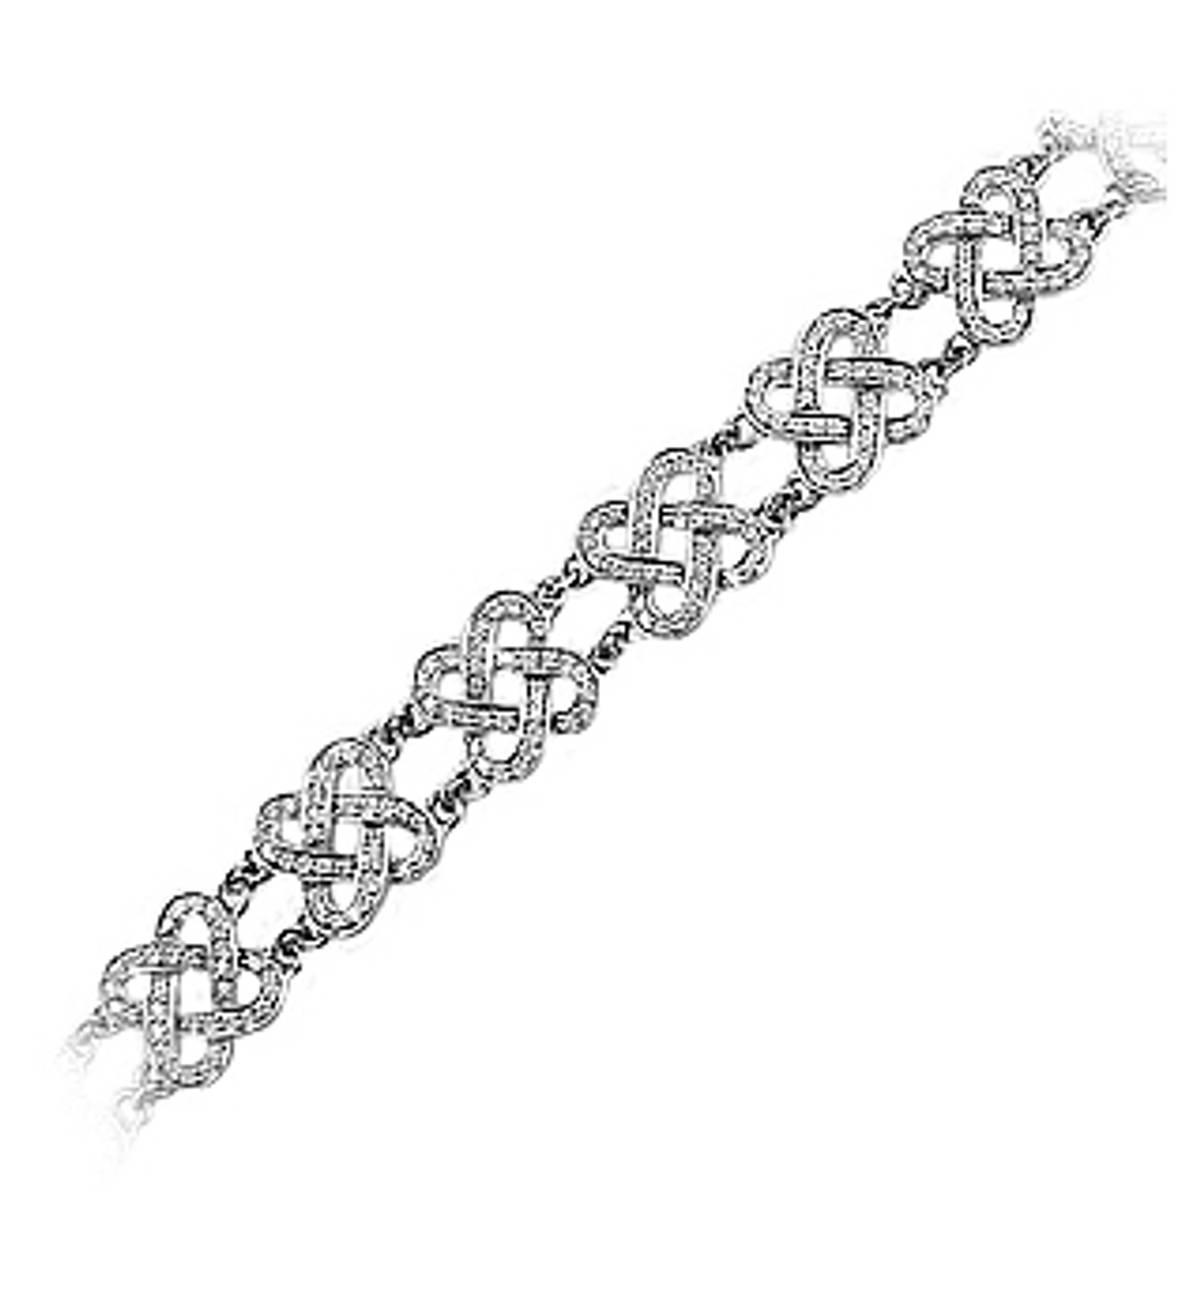 18 carat white gold bracelet with 2.00cts diamonds